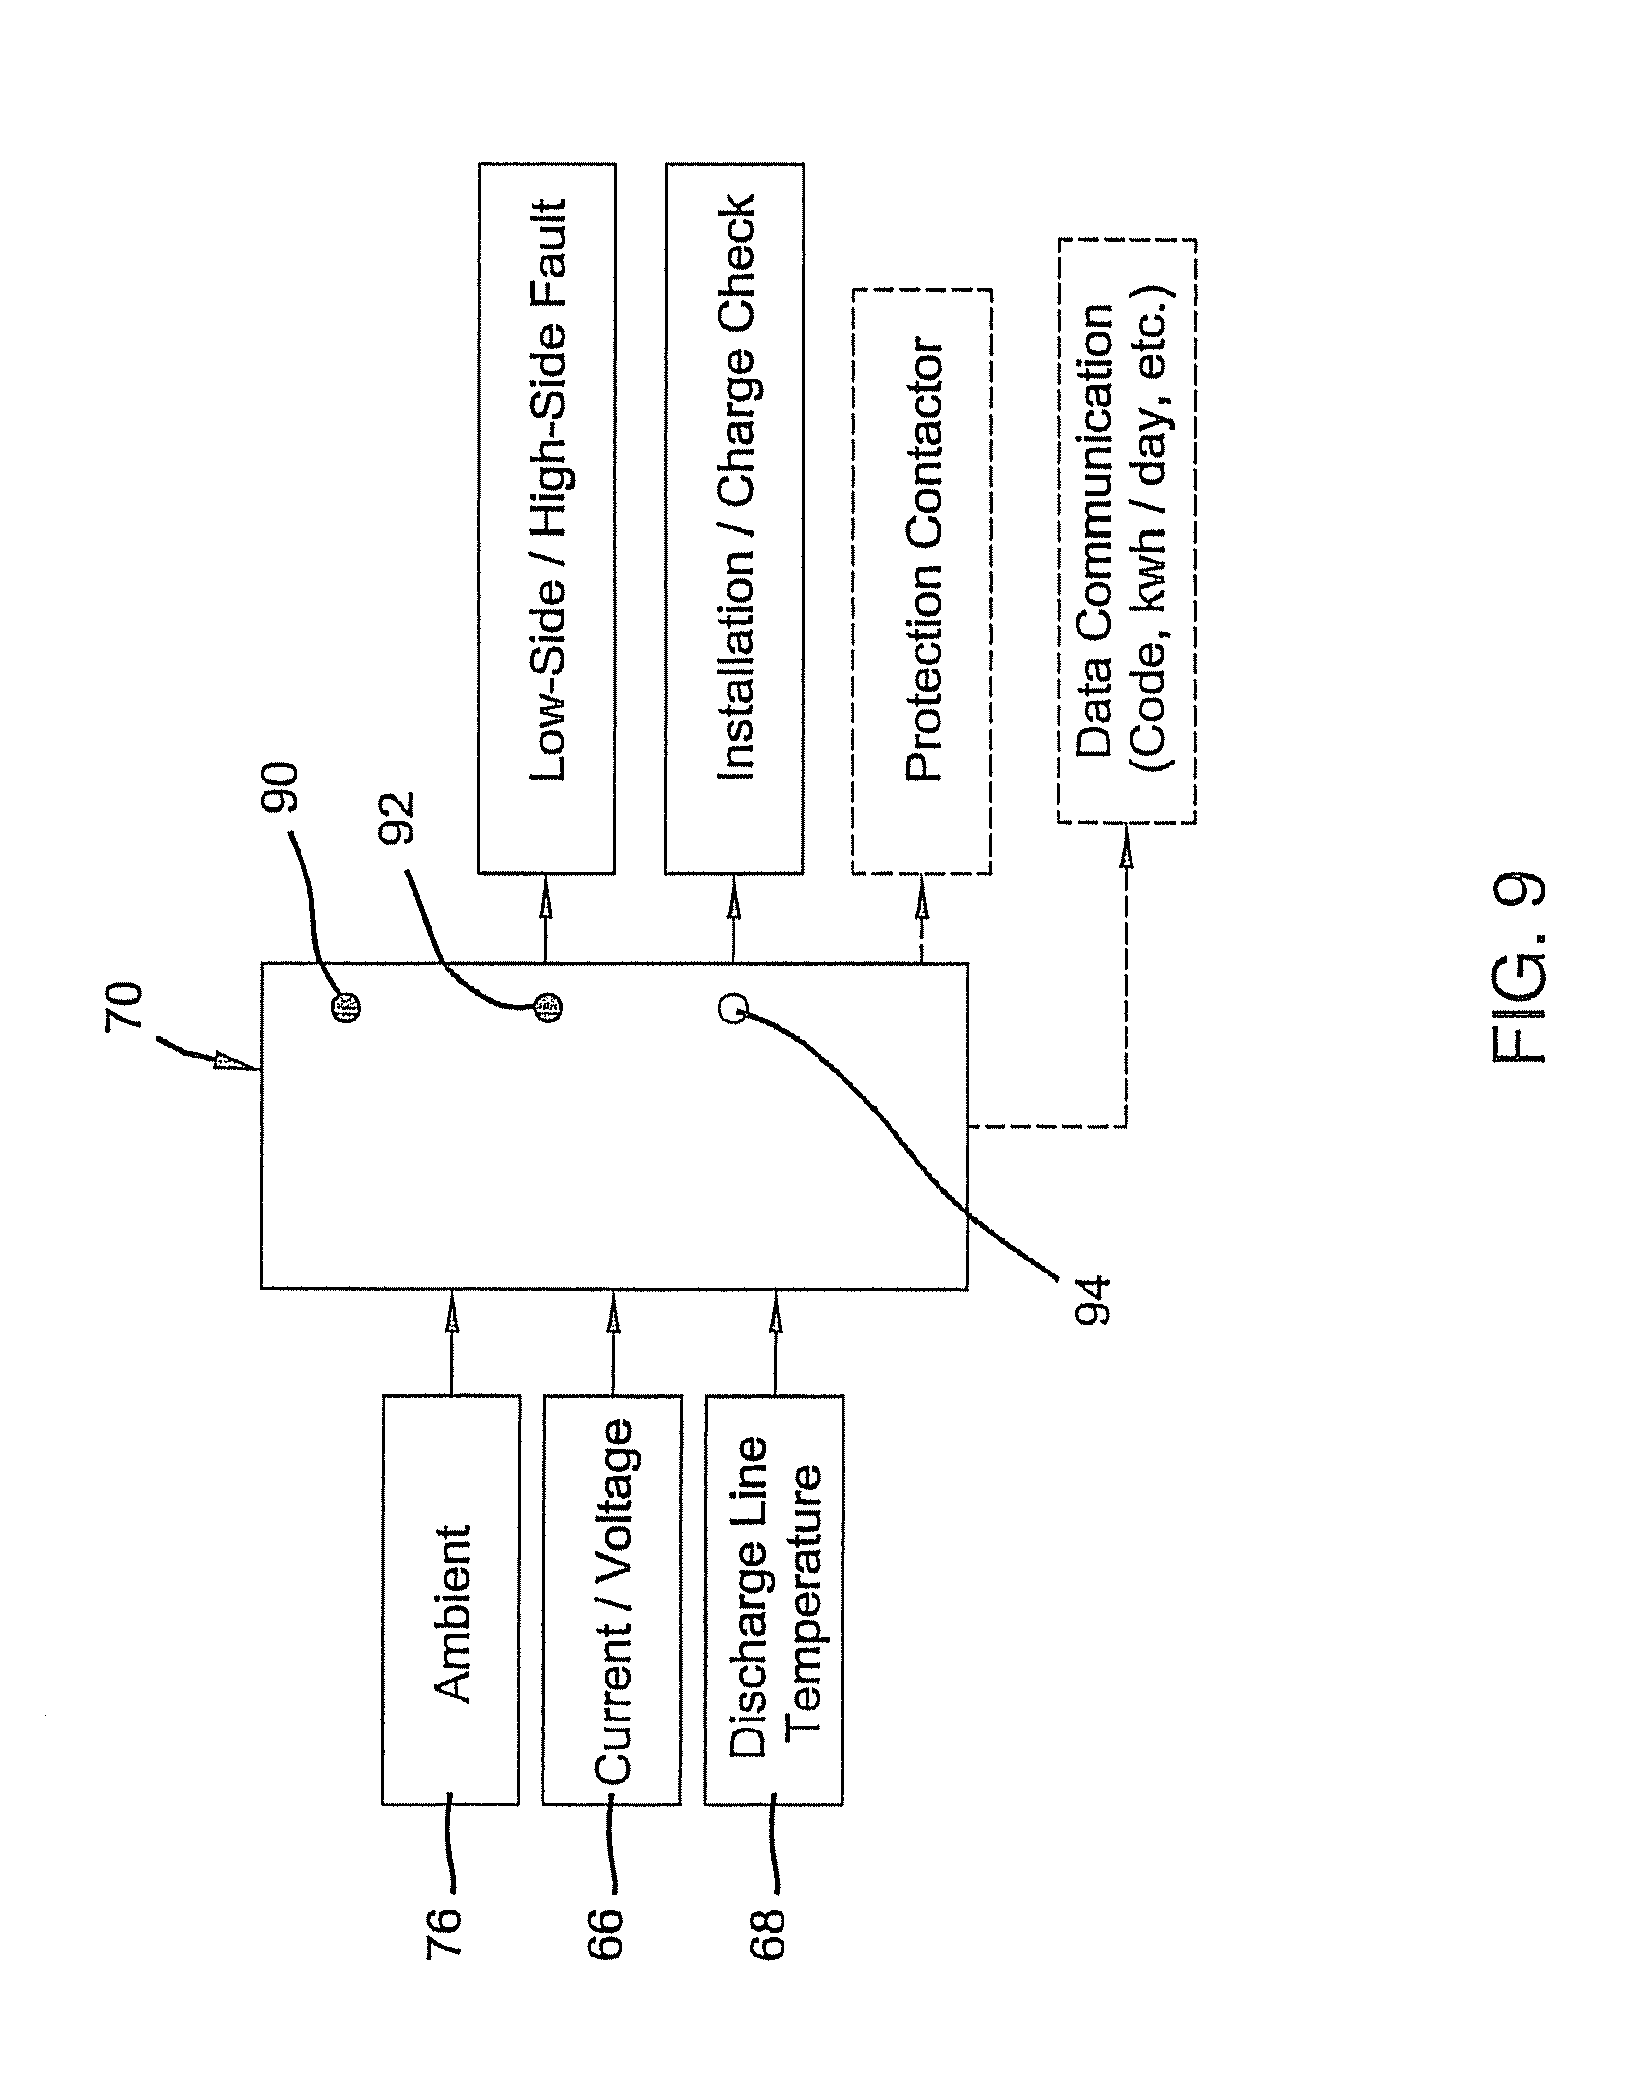 Patent US 9,669,498 B2